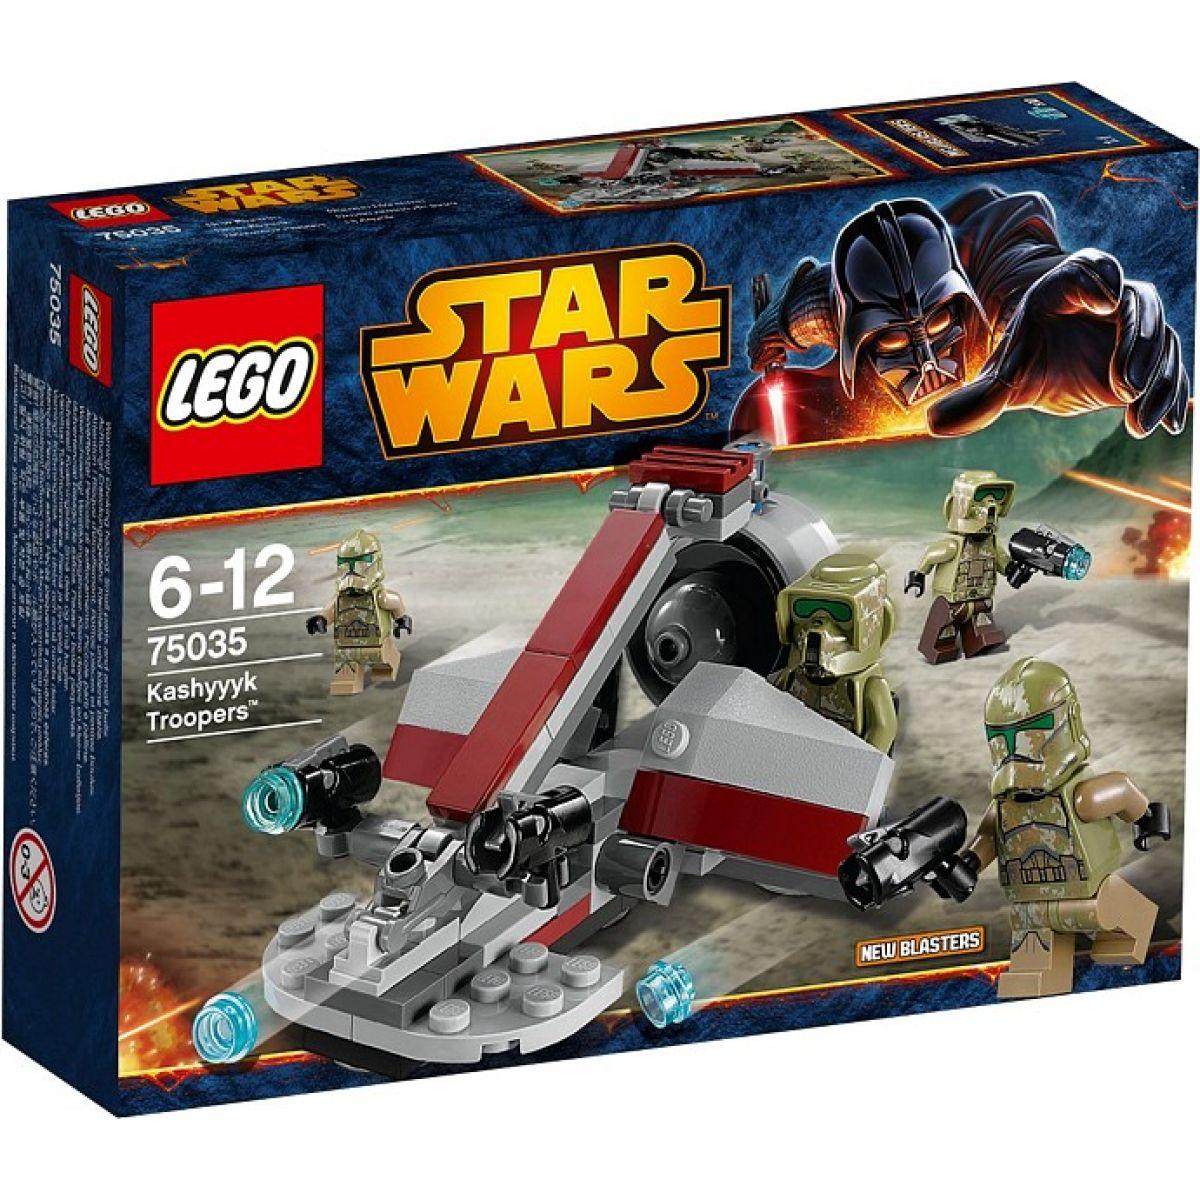 LEGO Star Wars 75035 Kashyyyk Troopers